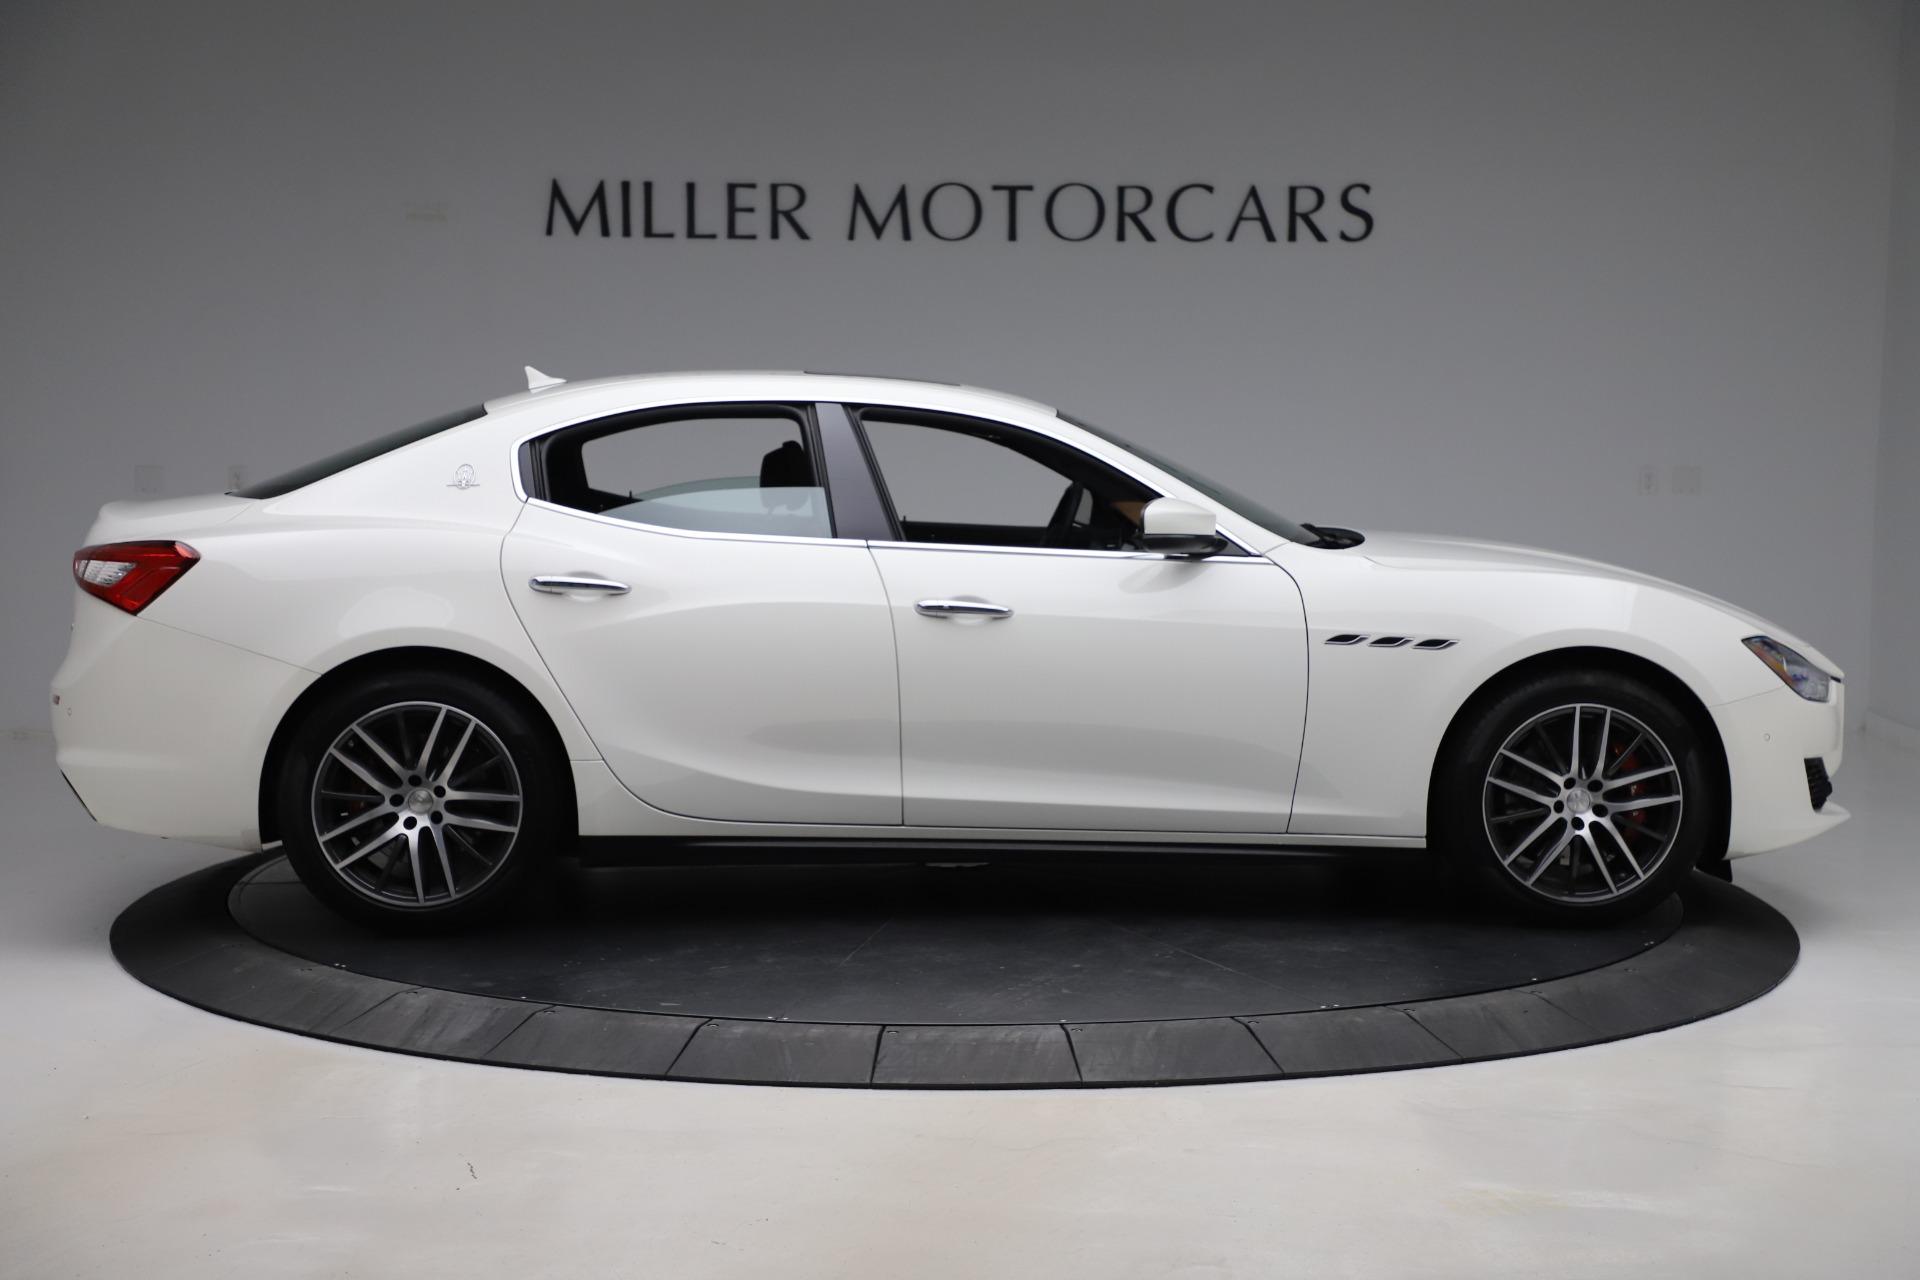 New 2019 Maserati Ghibli S Q4 For Sale 84865 In Greenwich, CT